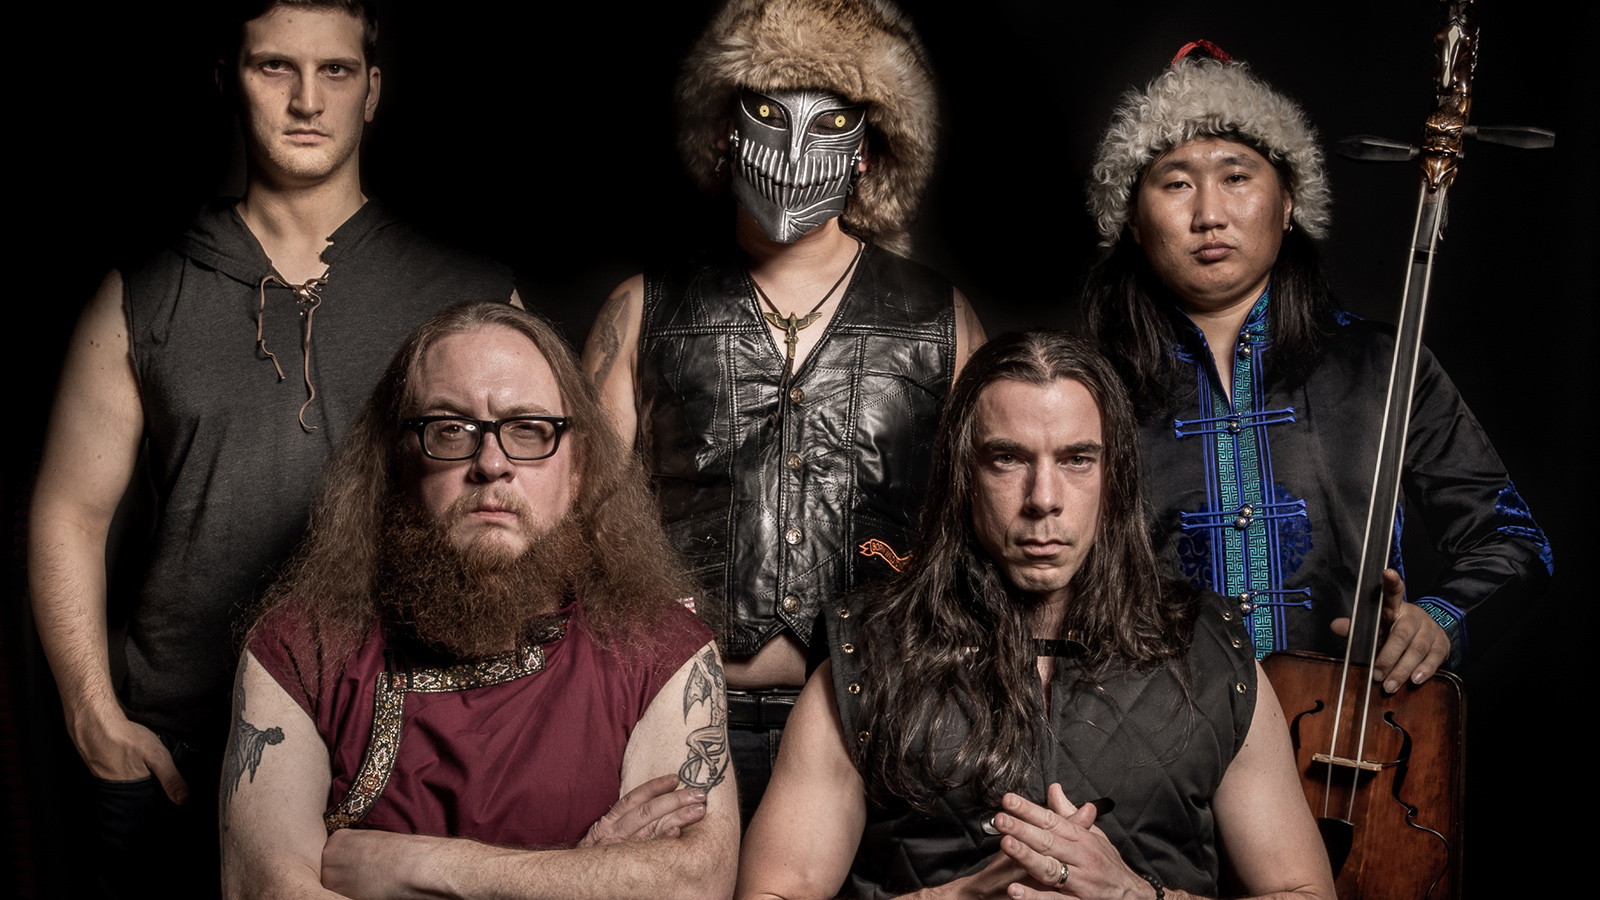 Hear Mongolian Folk-Metal Act Tengger Cavalry's New Album 'Northern Memory' in Full